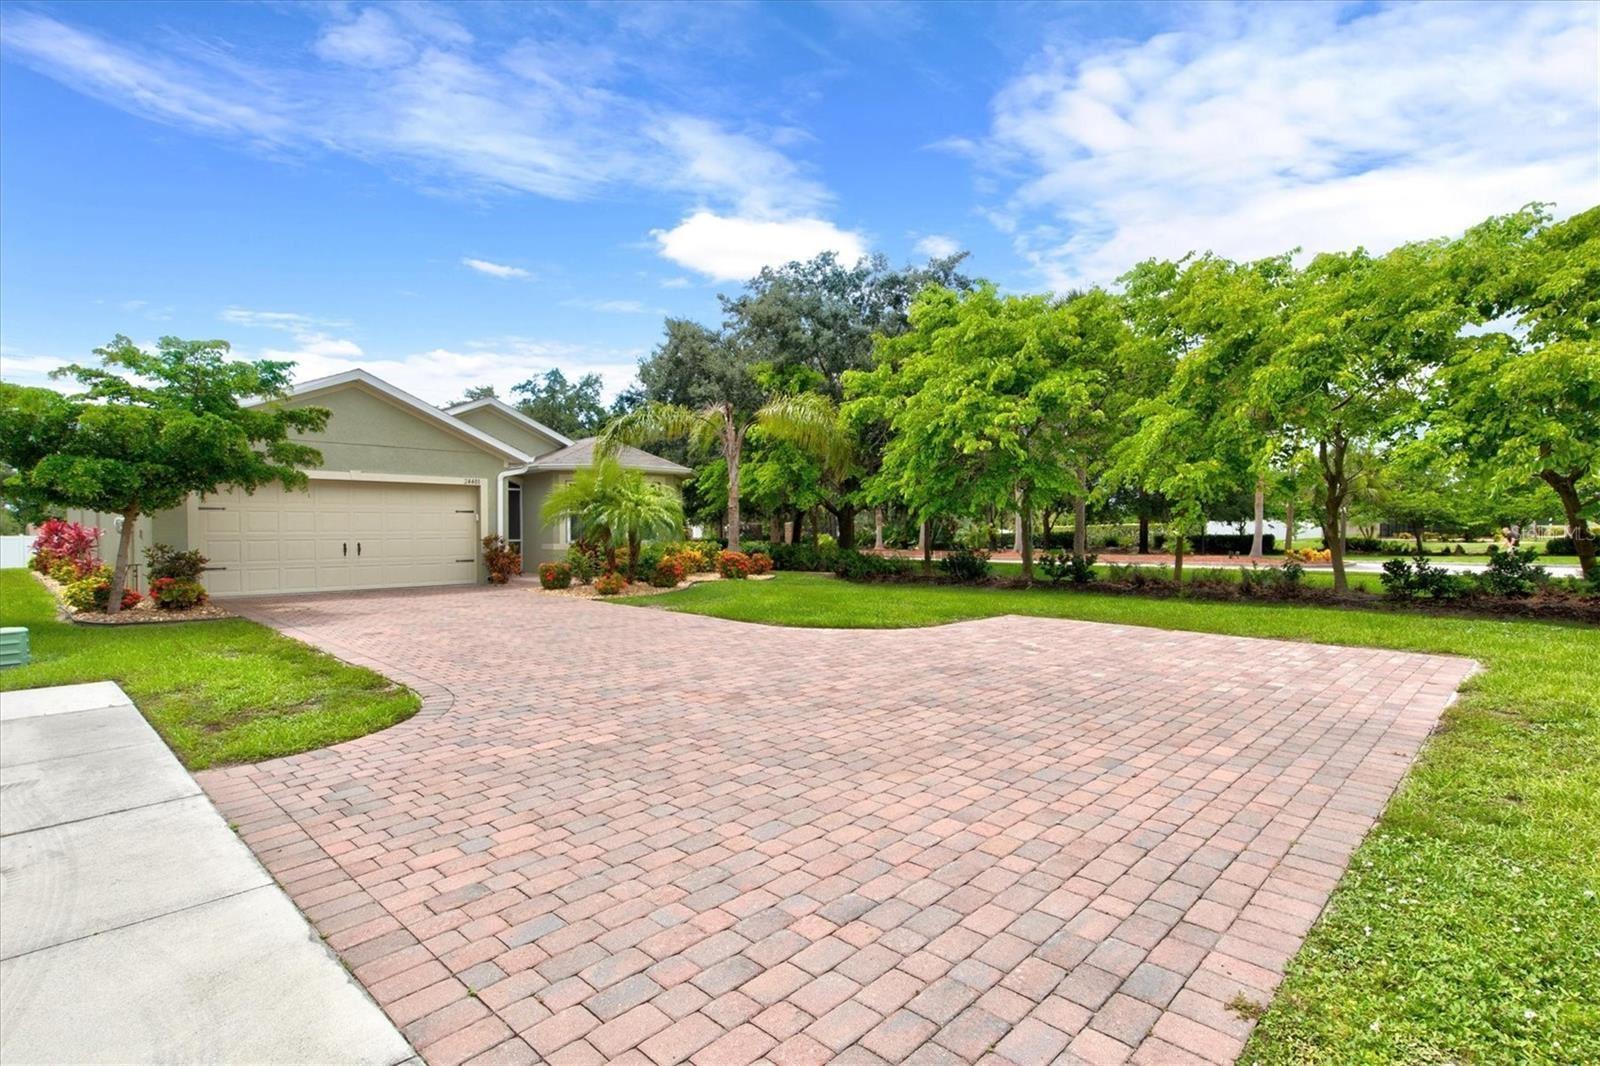 Photo of 24401 BANDONI PLACE, VENICE, FL 34293 (MLS # A4506589)